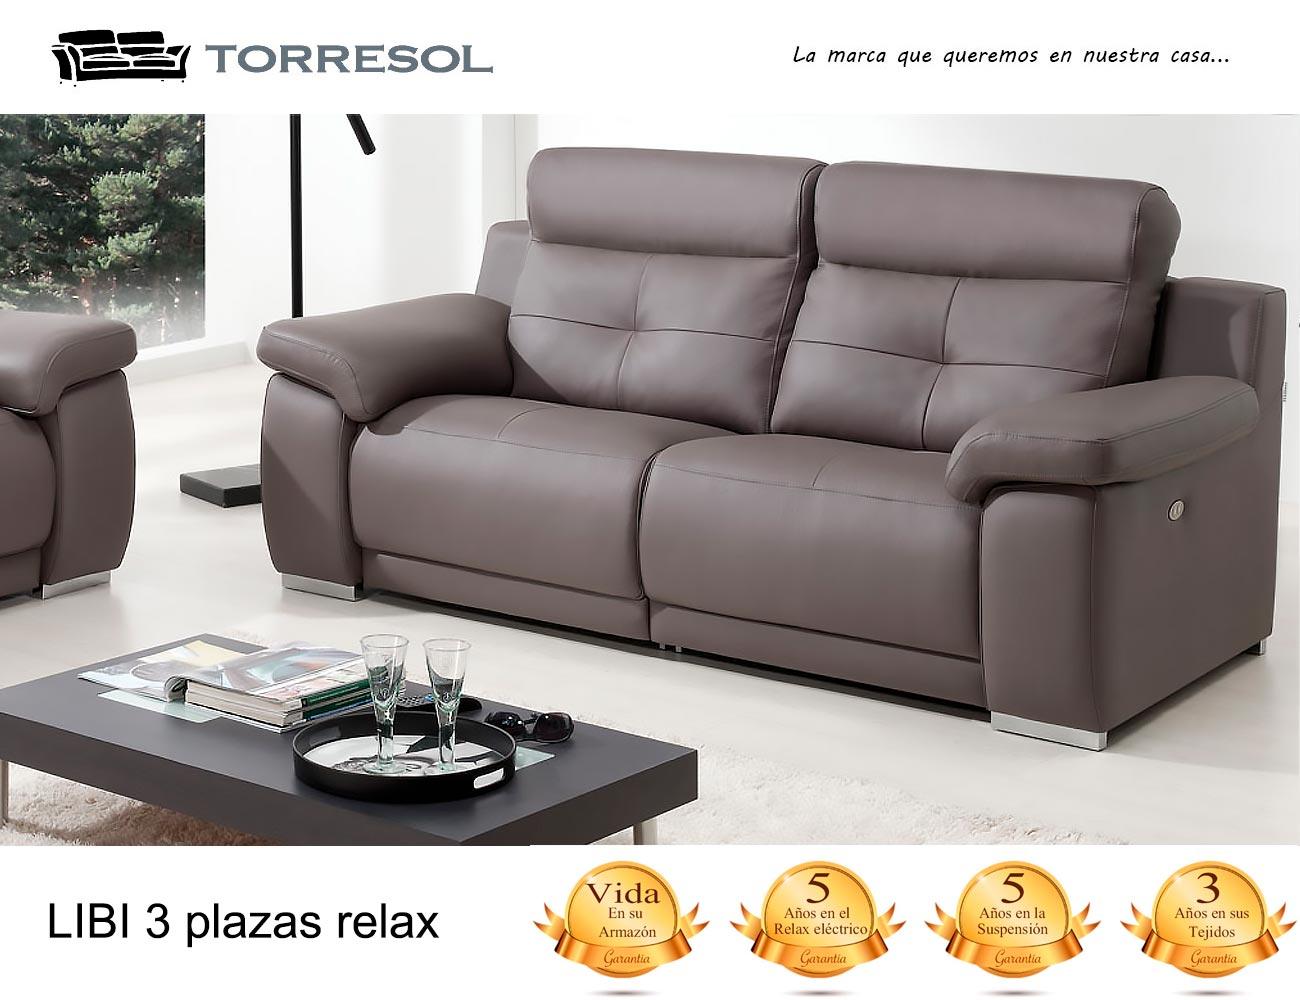 Sofa libi torresol en piel chocolate 3